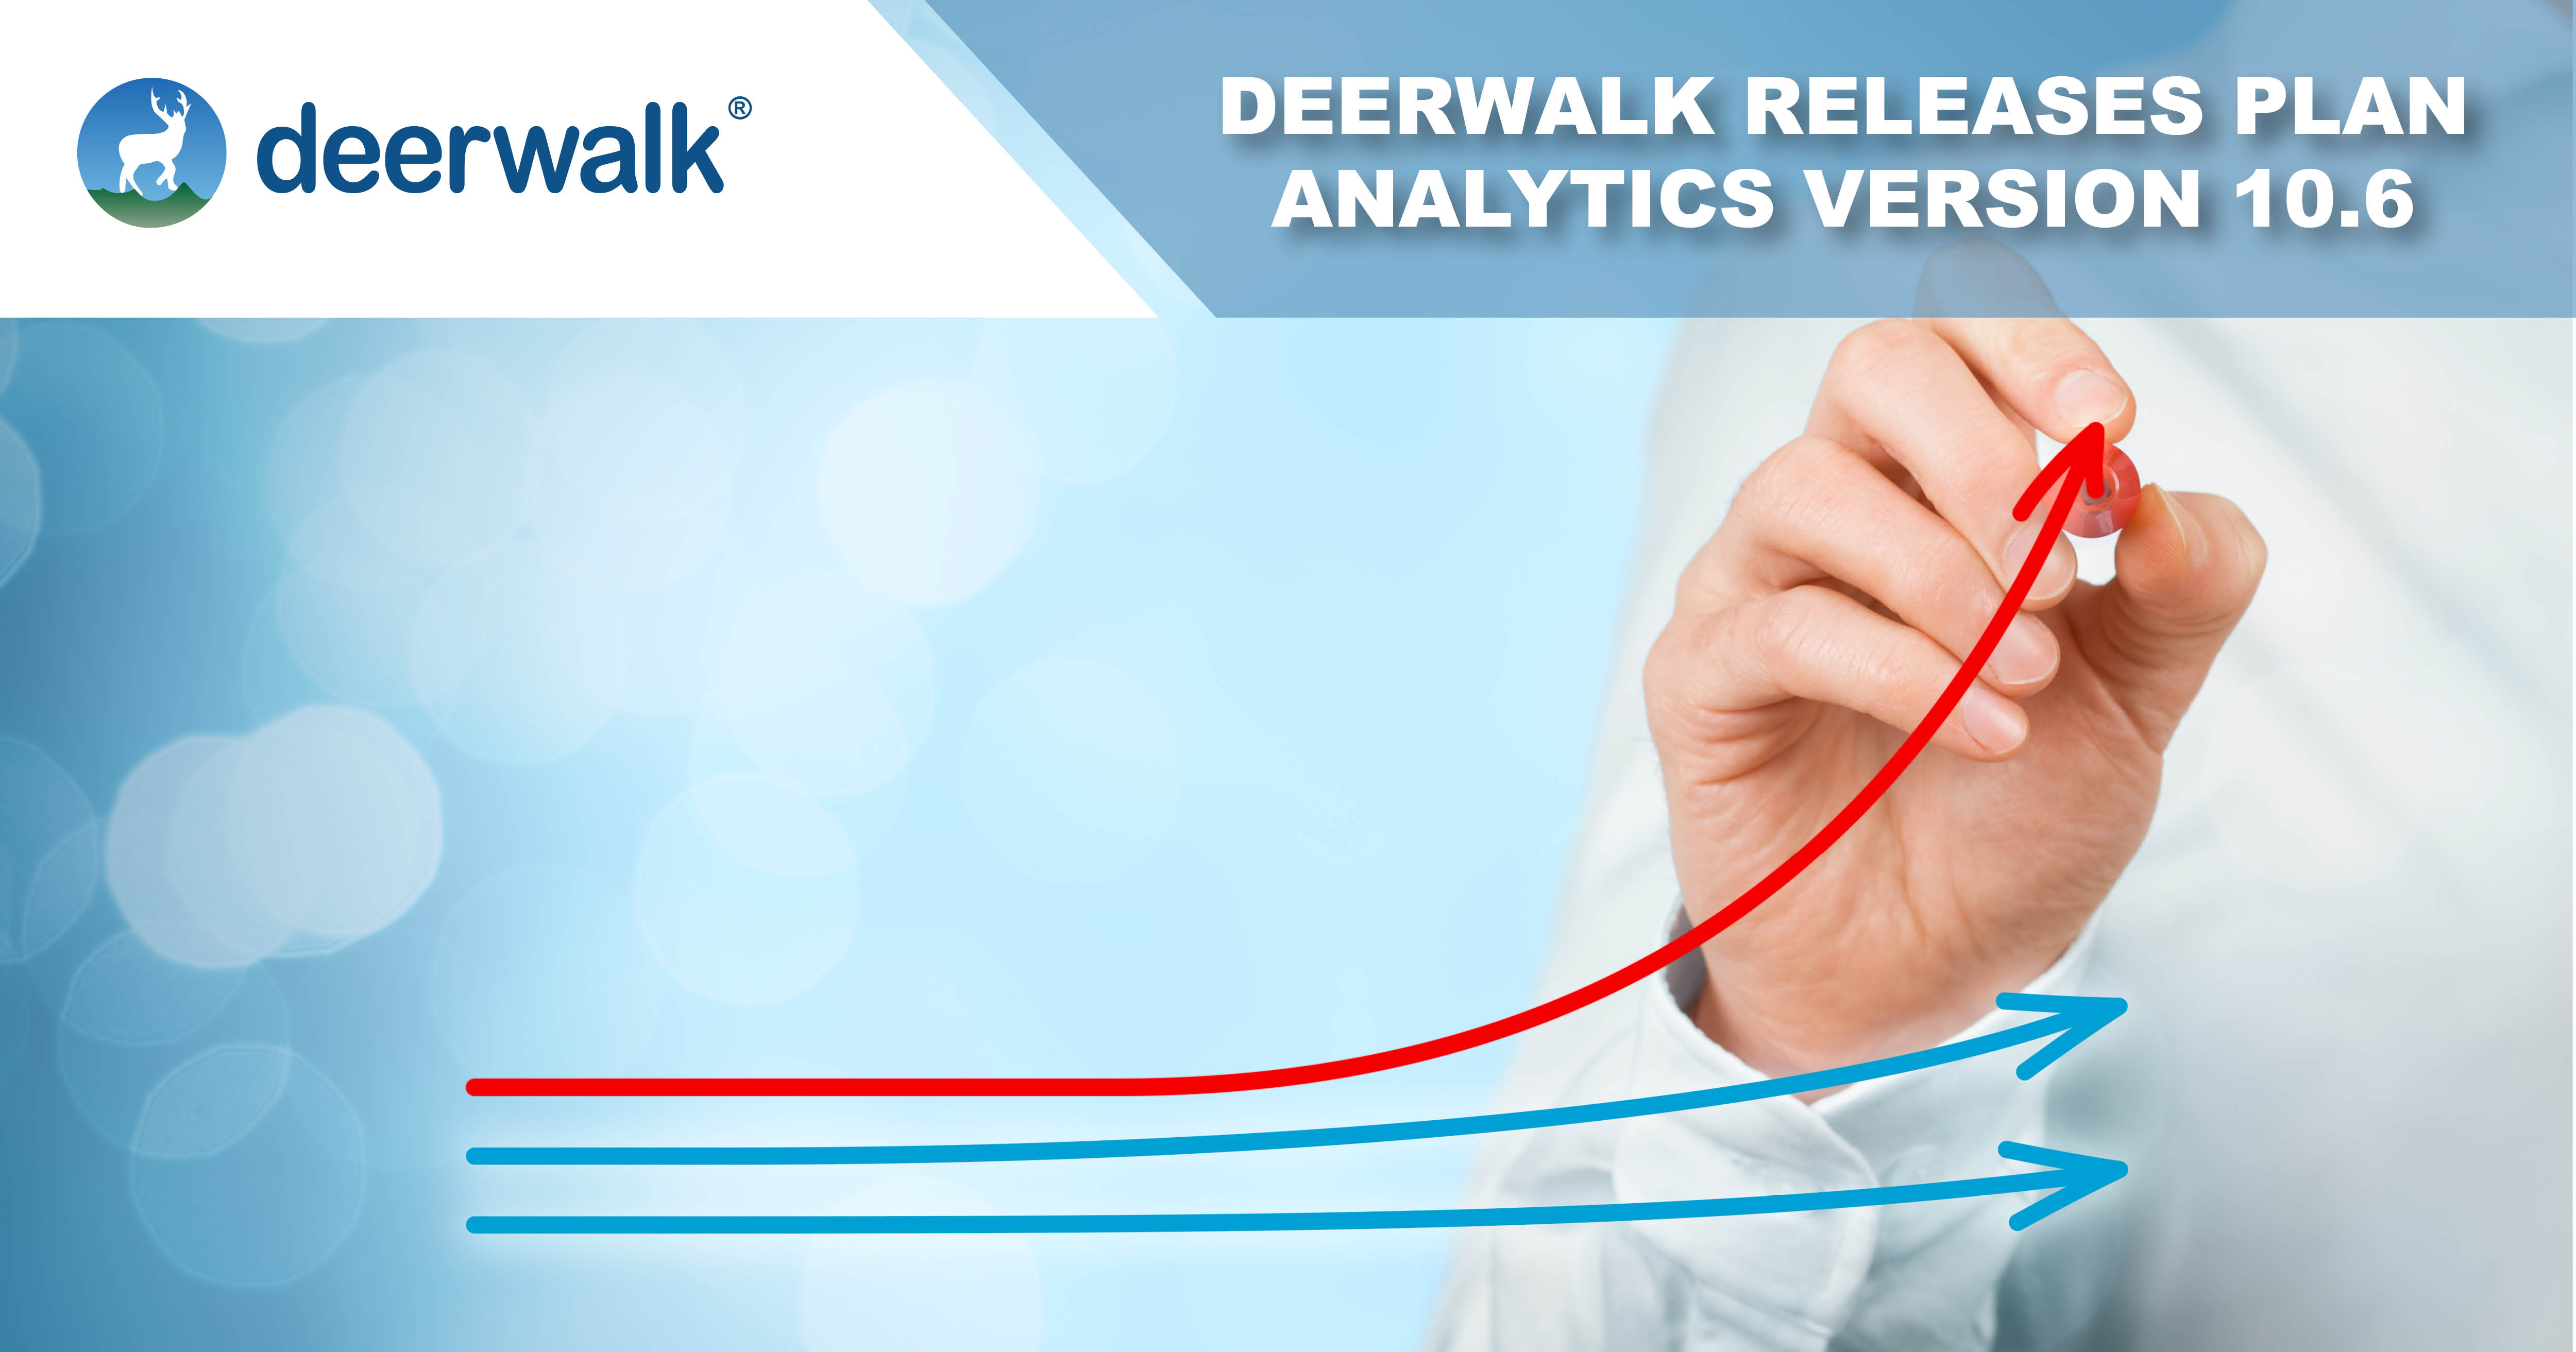 Deerwalk Plan Analytics Version 10.6 Enables You to Create Dynamic Benchmark Reporting